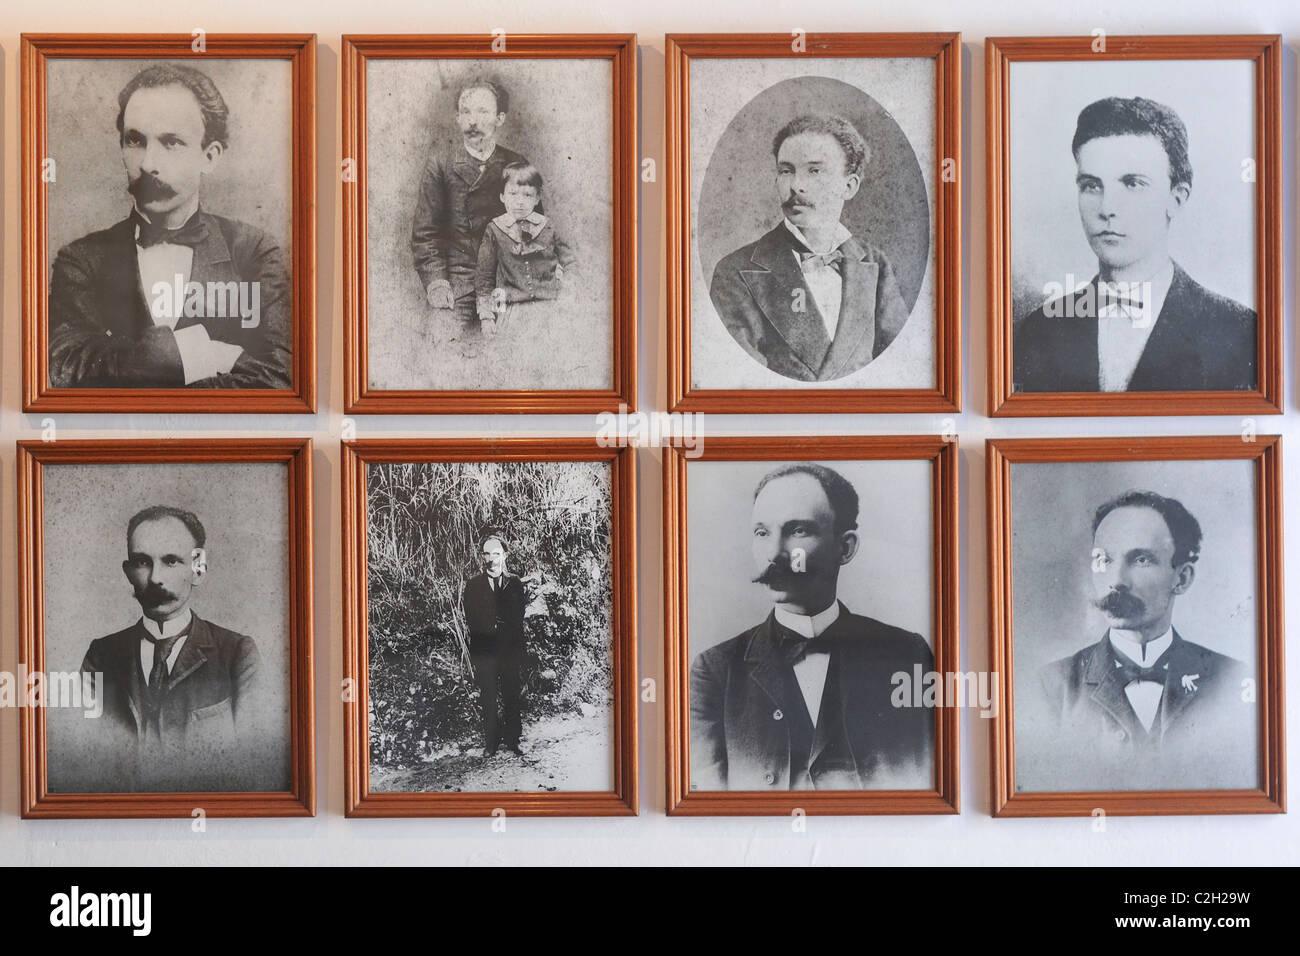 Havana. Cuba. Portraits of José Marti, Casa Natal de José Marti / Birthplace of José Marti, Habana - Stock Image